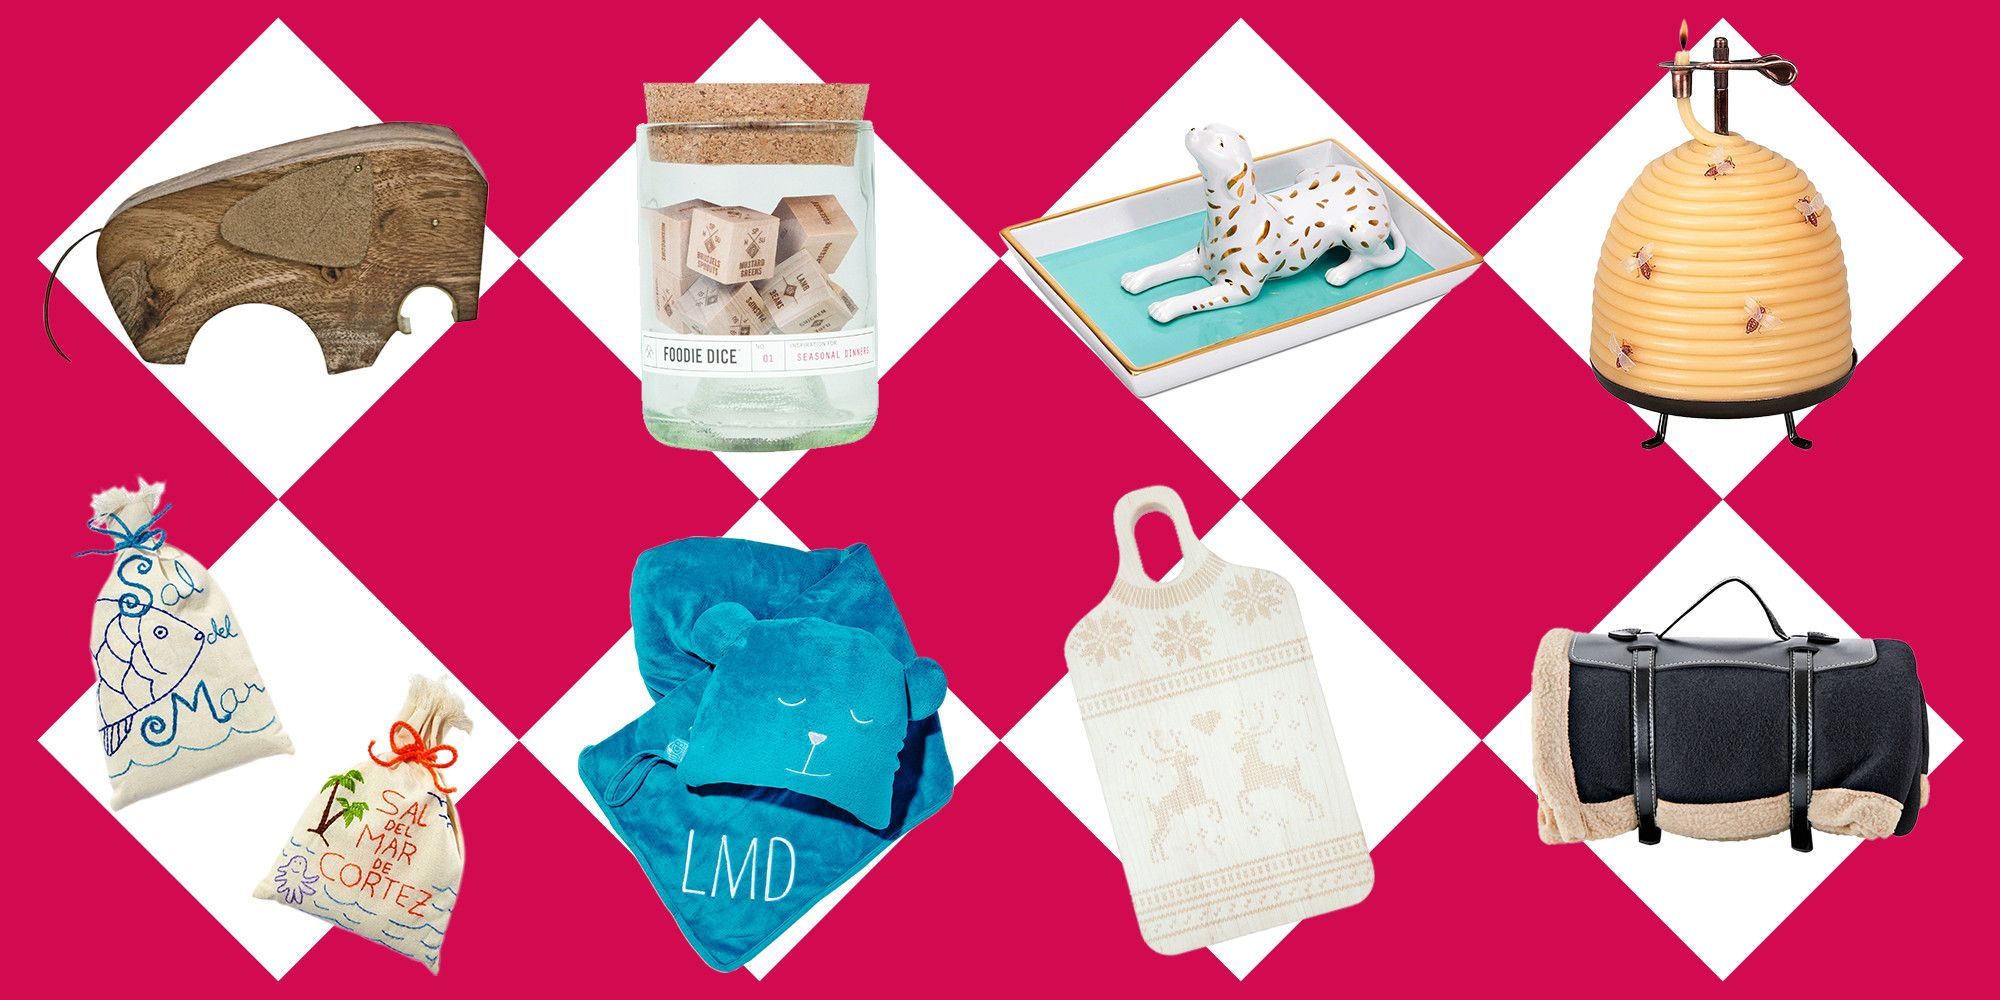 Unisex christmas gift ideas for $50